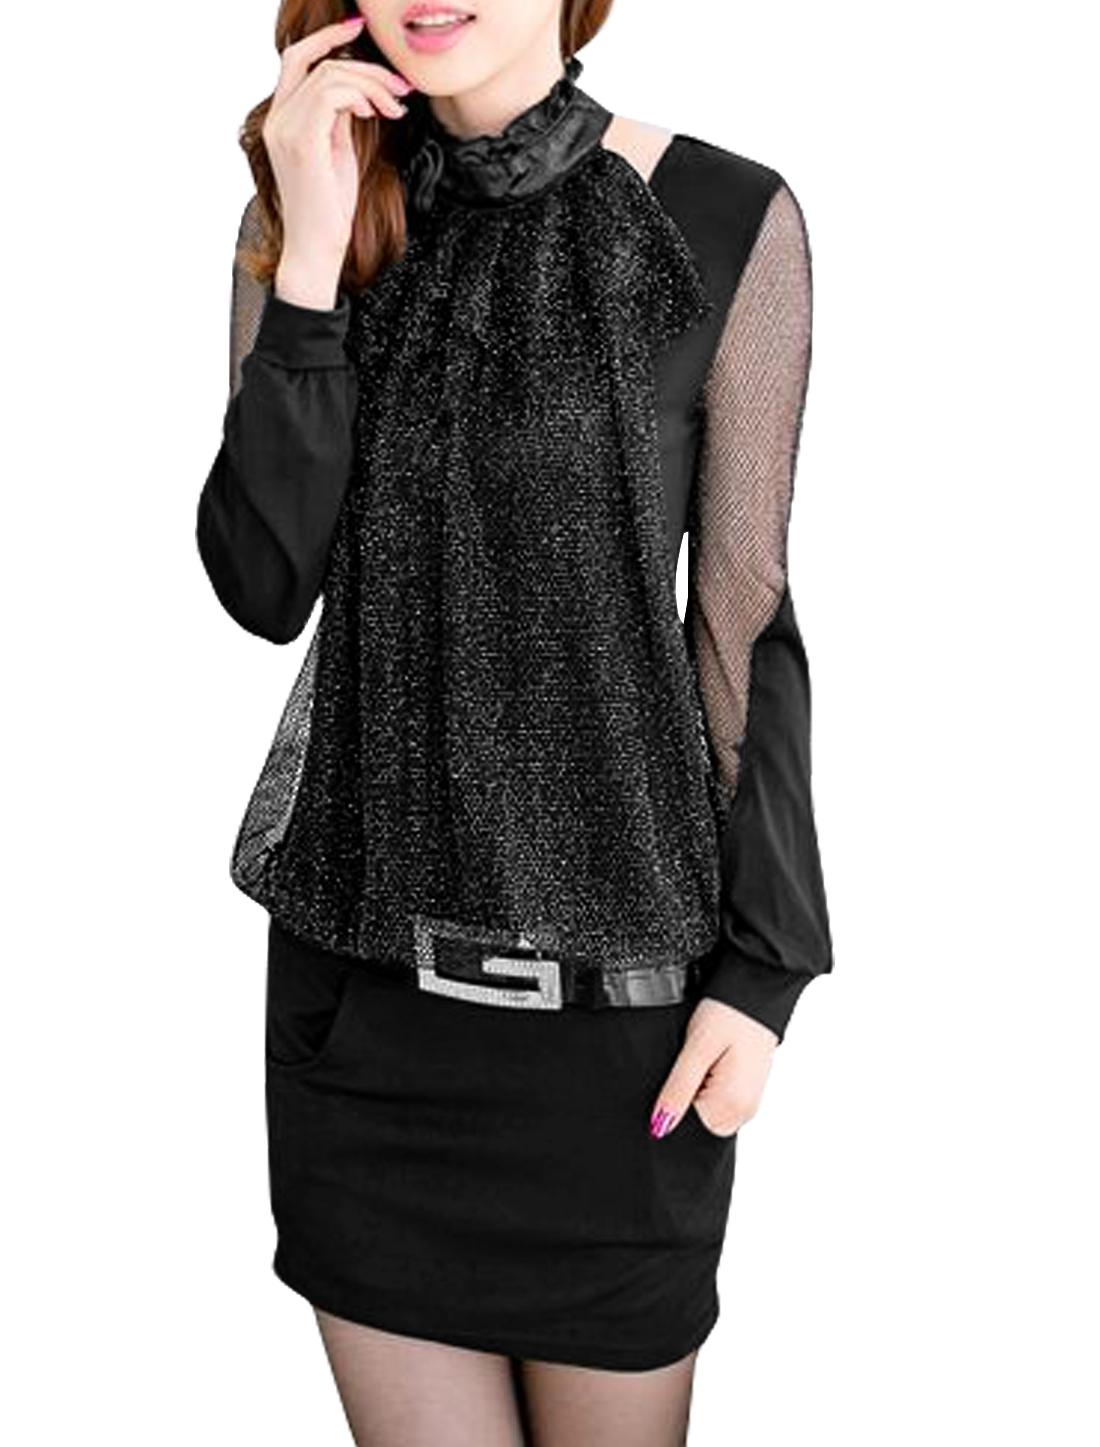 Lady Ruffled Collar Mesh Panel Brooch Pencil Dress w Belt Silver S